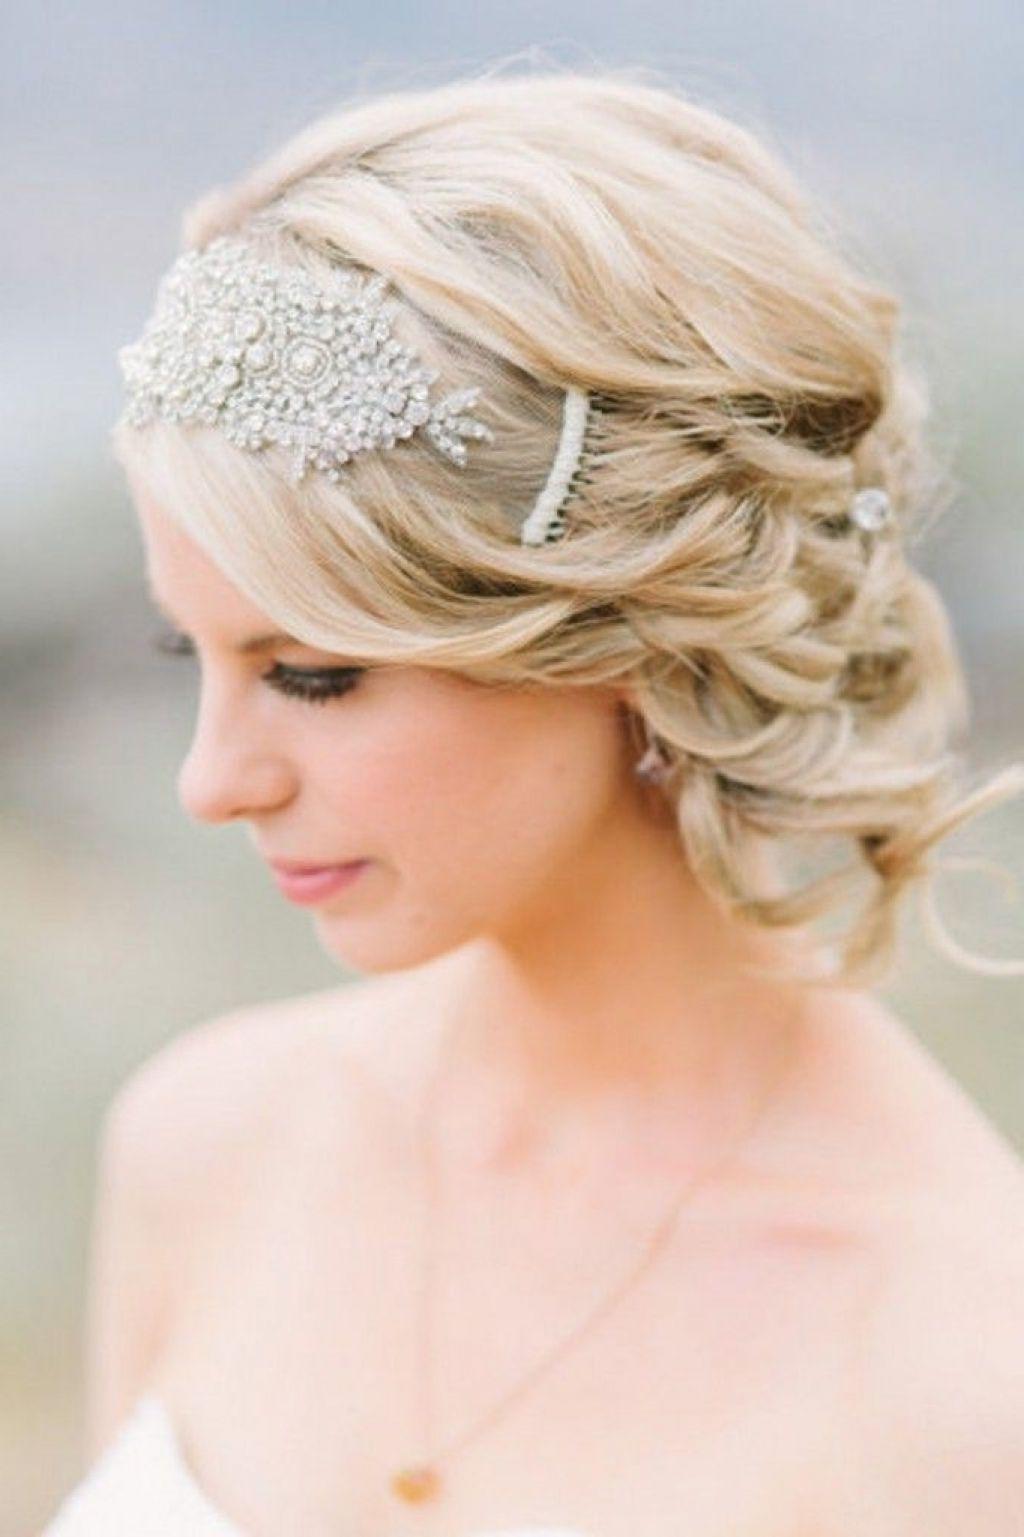 50 fabulous bridal hairstyles for short hair short hairstyles